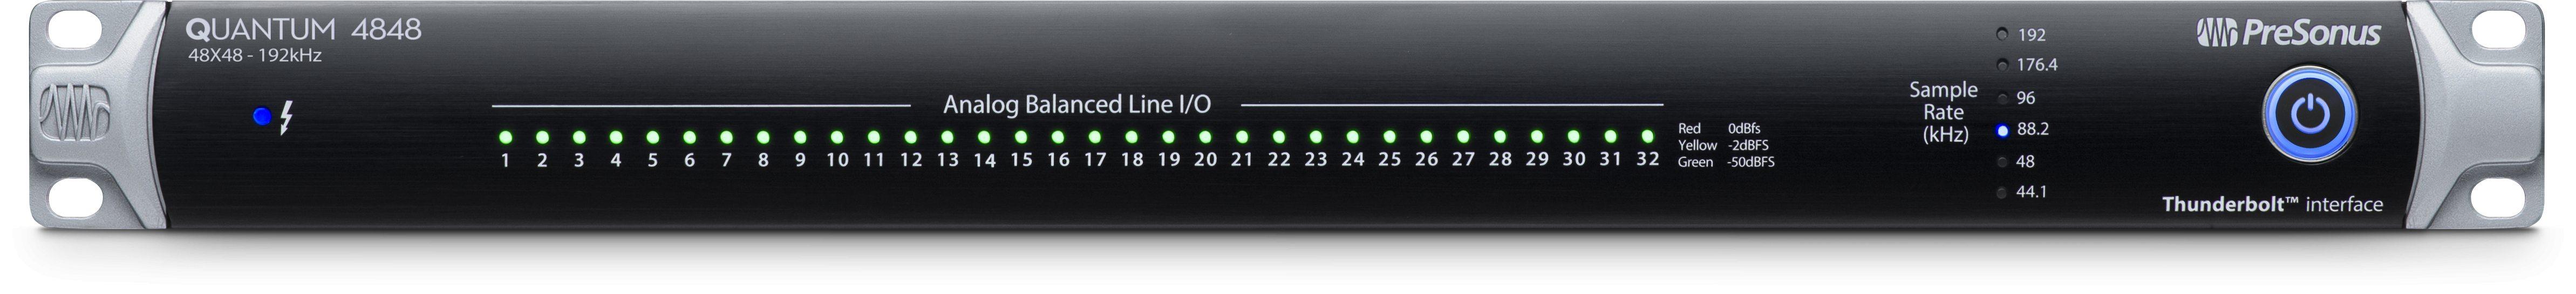 Presonus 发布最新 Quantum 4848 专业音频接口(视频)